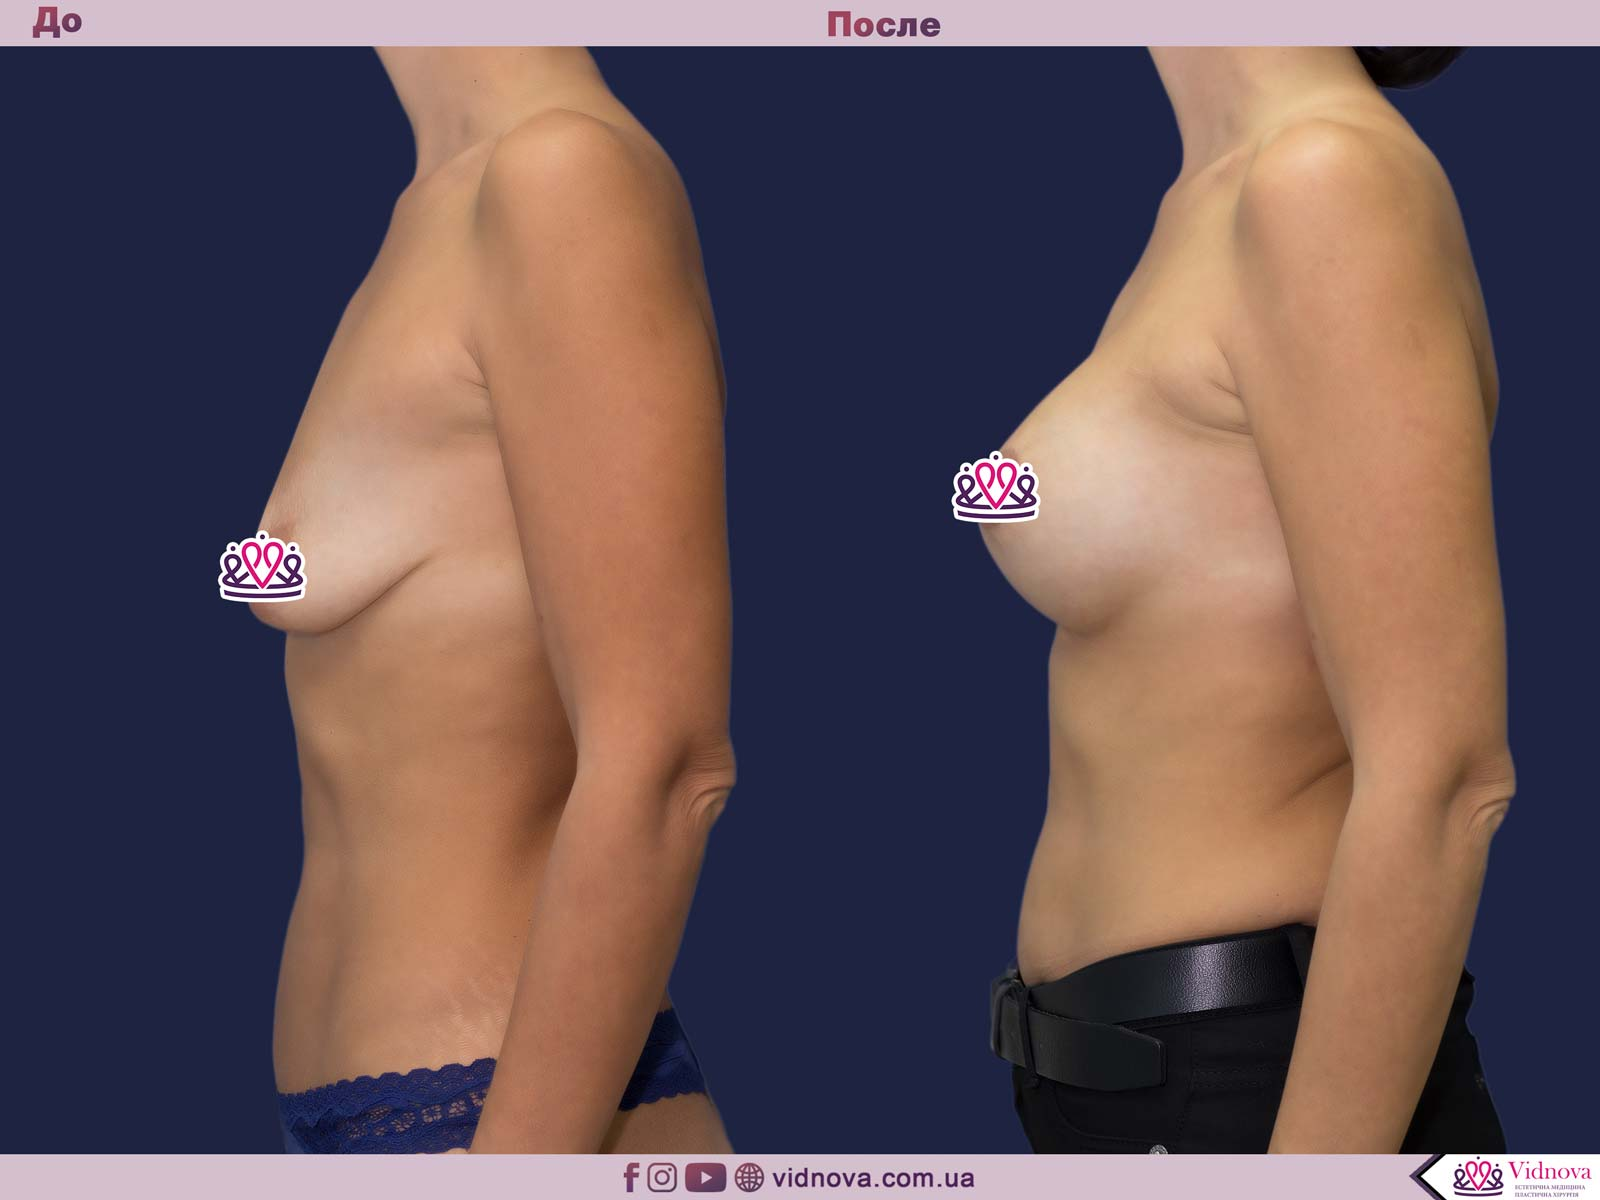 Увеличение груди: Фото ДО и ПОСЛЕ - Пример №74-3 - Клиника Vidnova